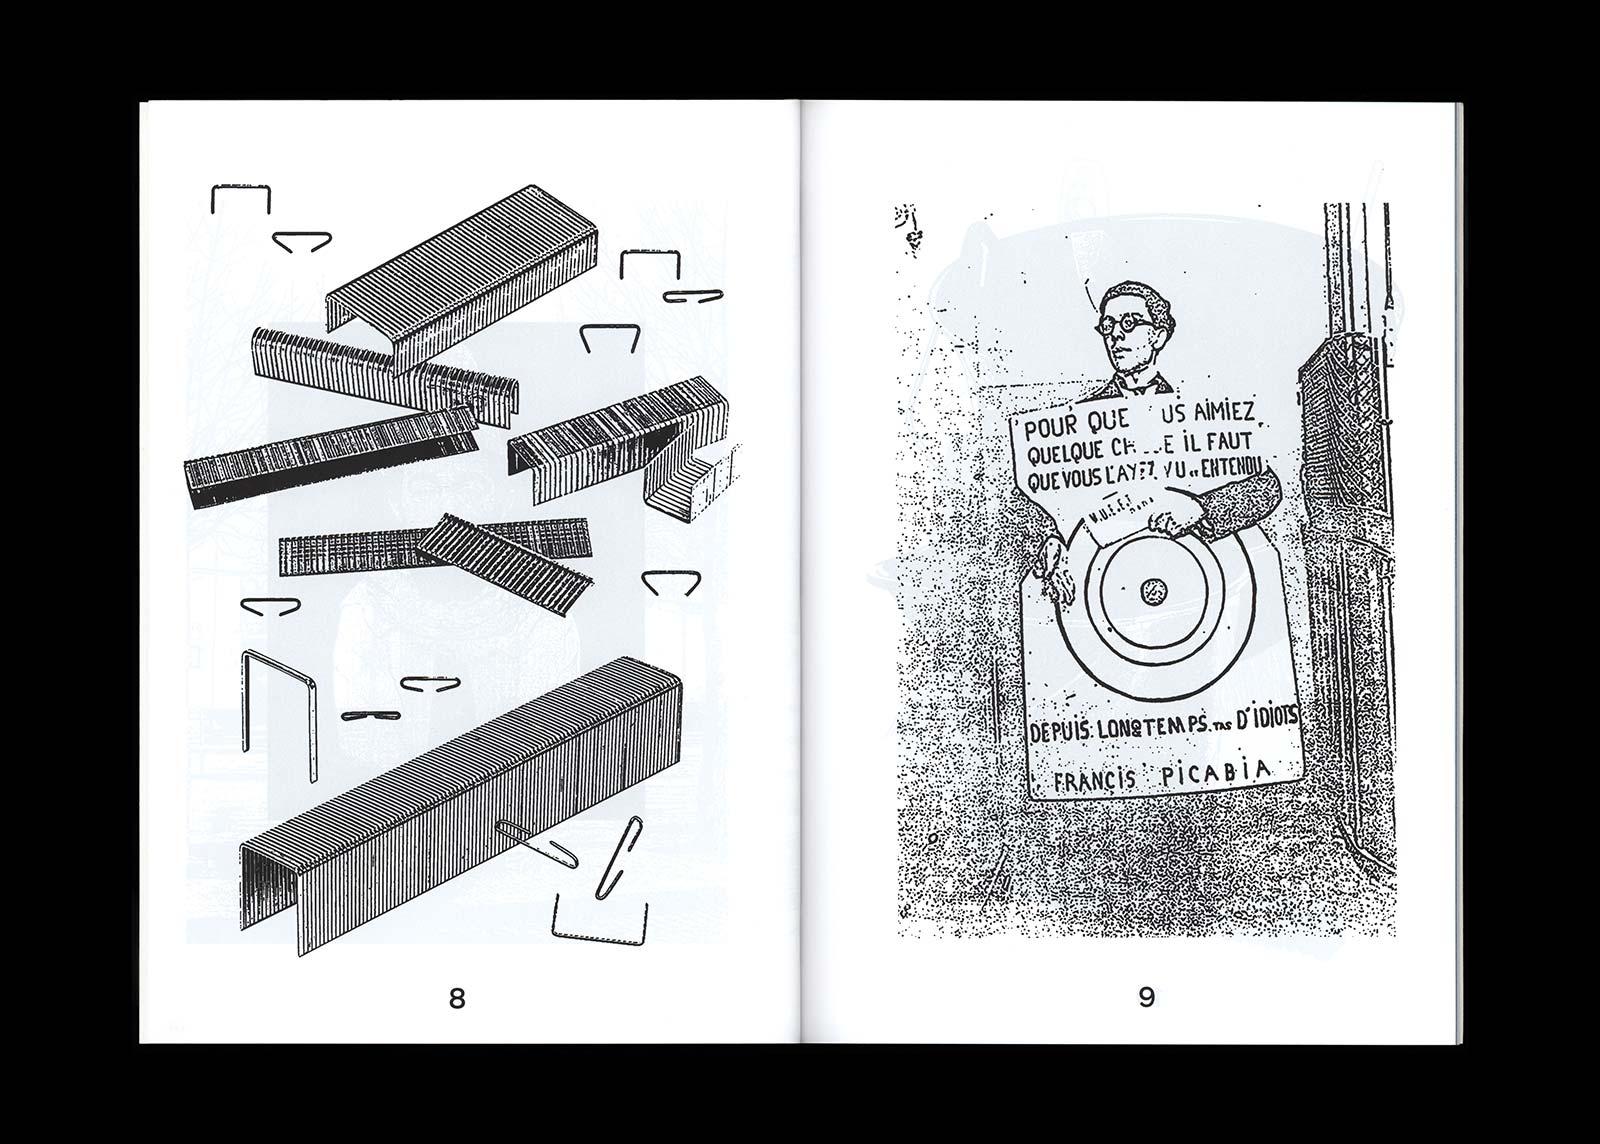 Chaumont catalogue 04